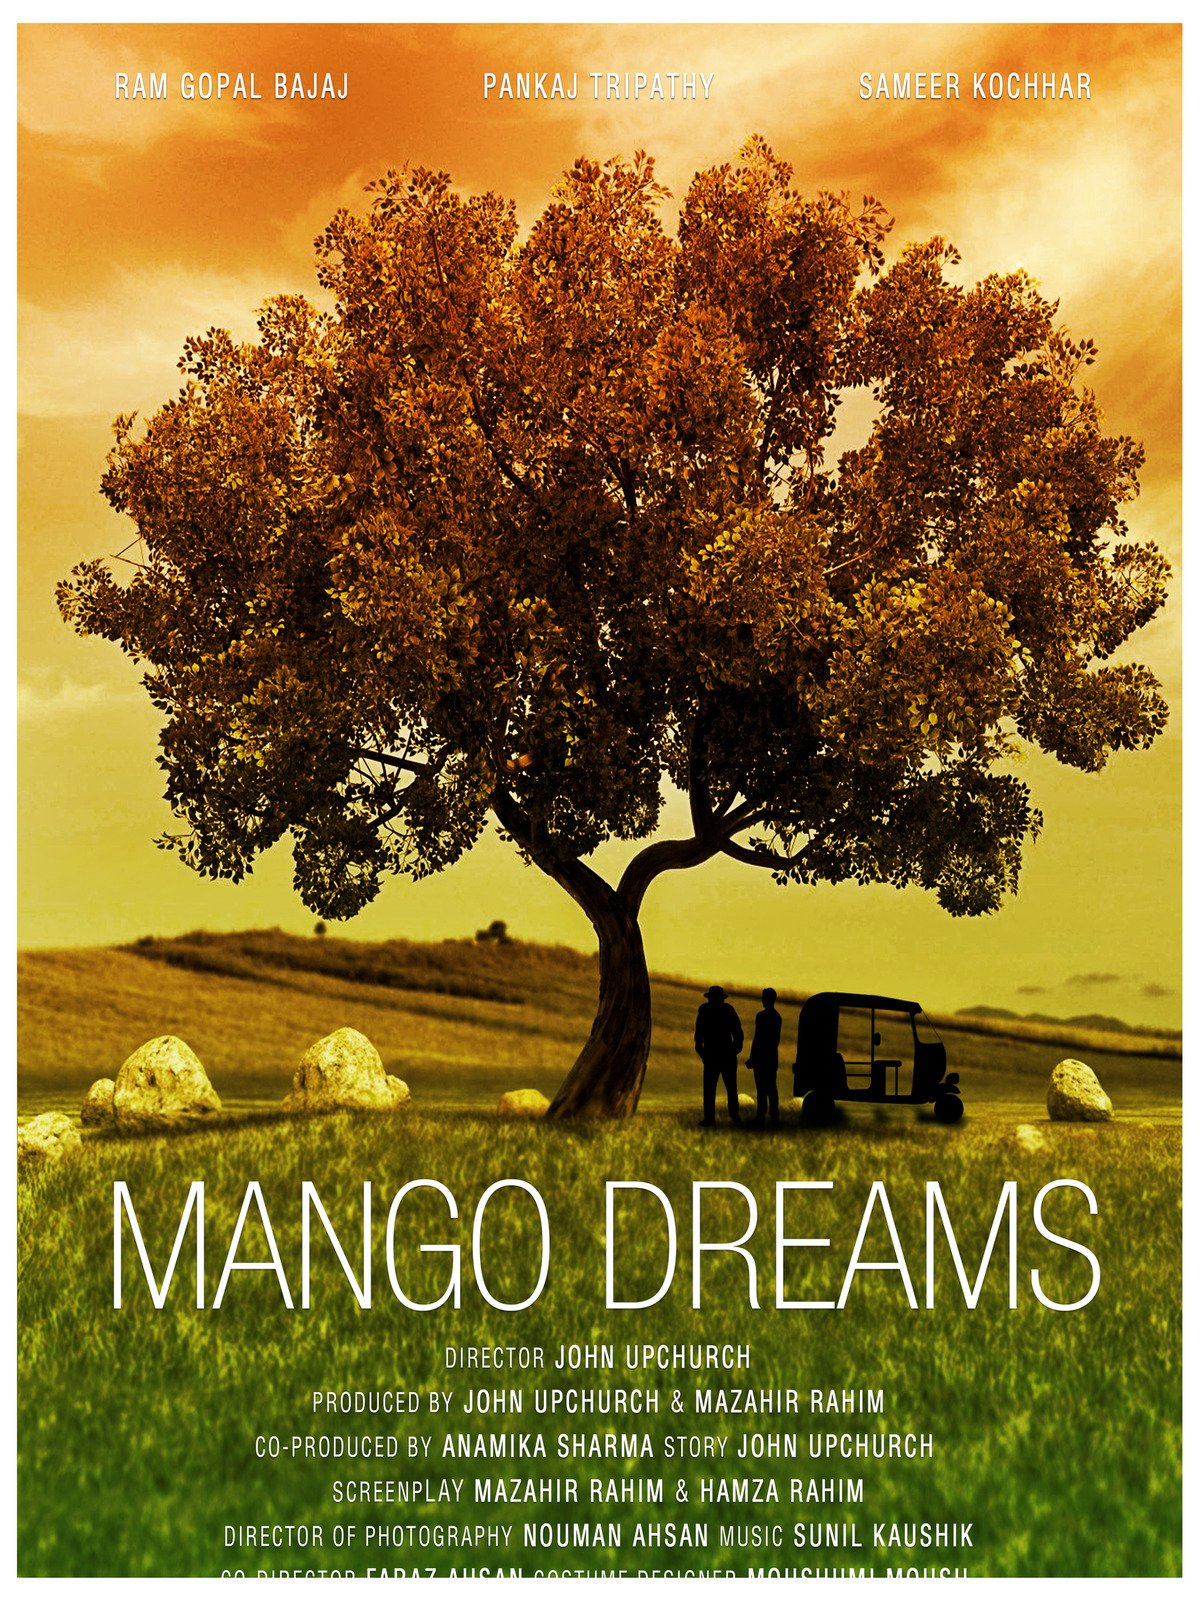 Free Download Mango Dreams (2016) NF Hollywood English Movie 720p HDRip 500MB On Mp4moviez Fliz Movies